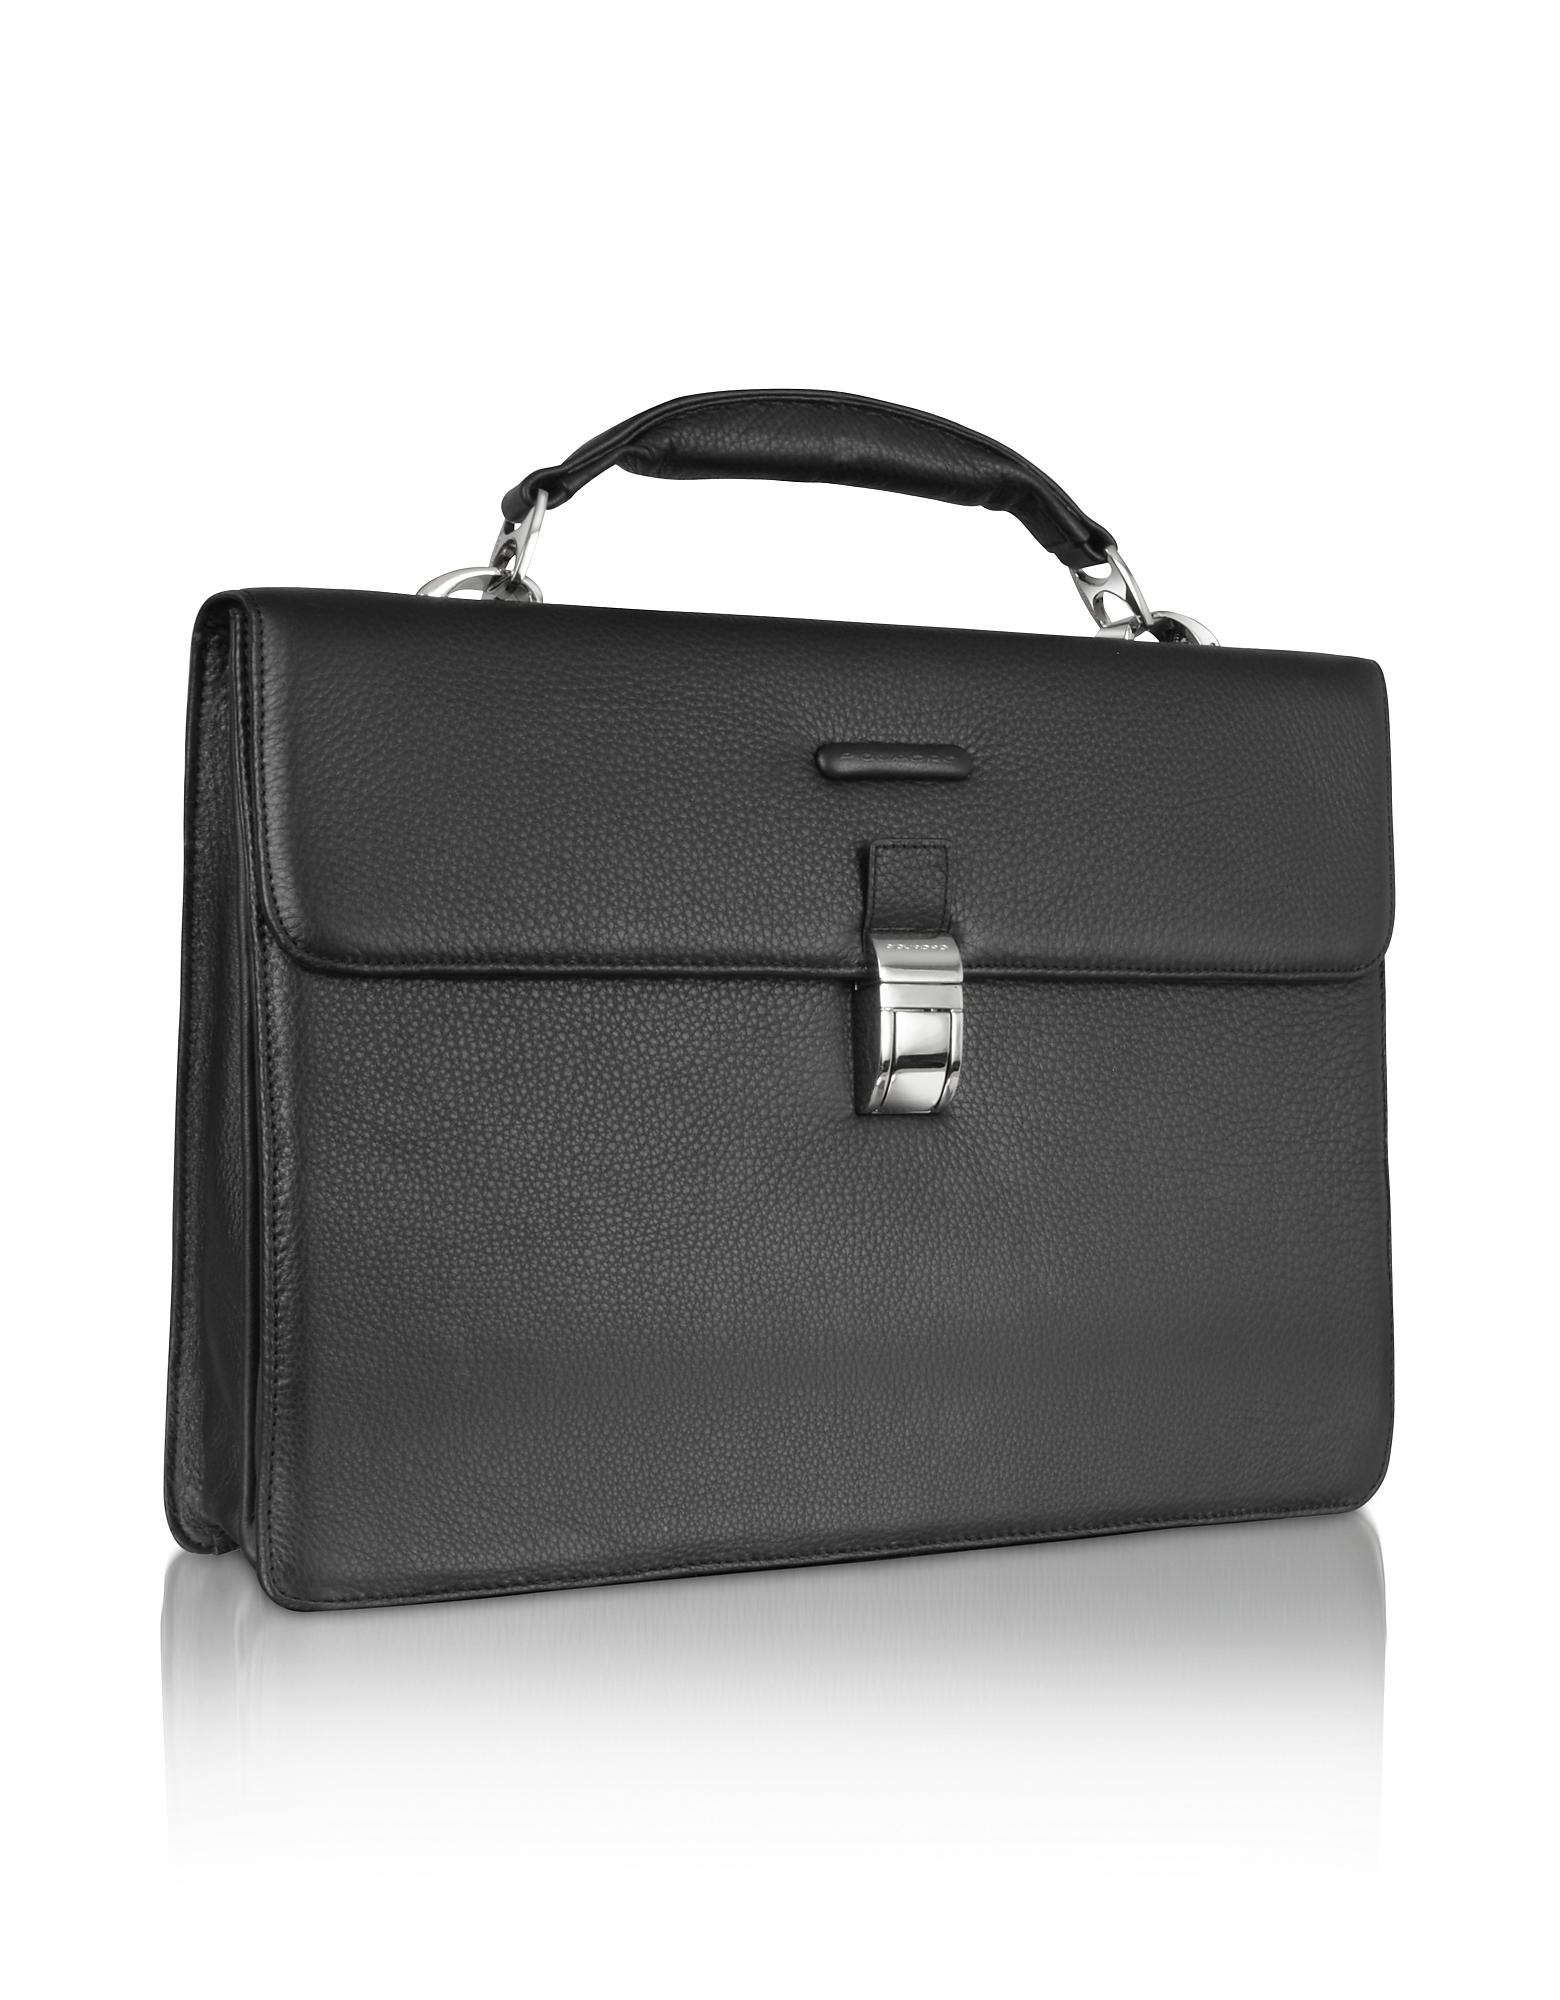 Piquadro Briefcases, Modus - Black Leather Laptop Briefcase